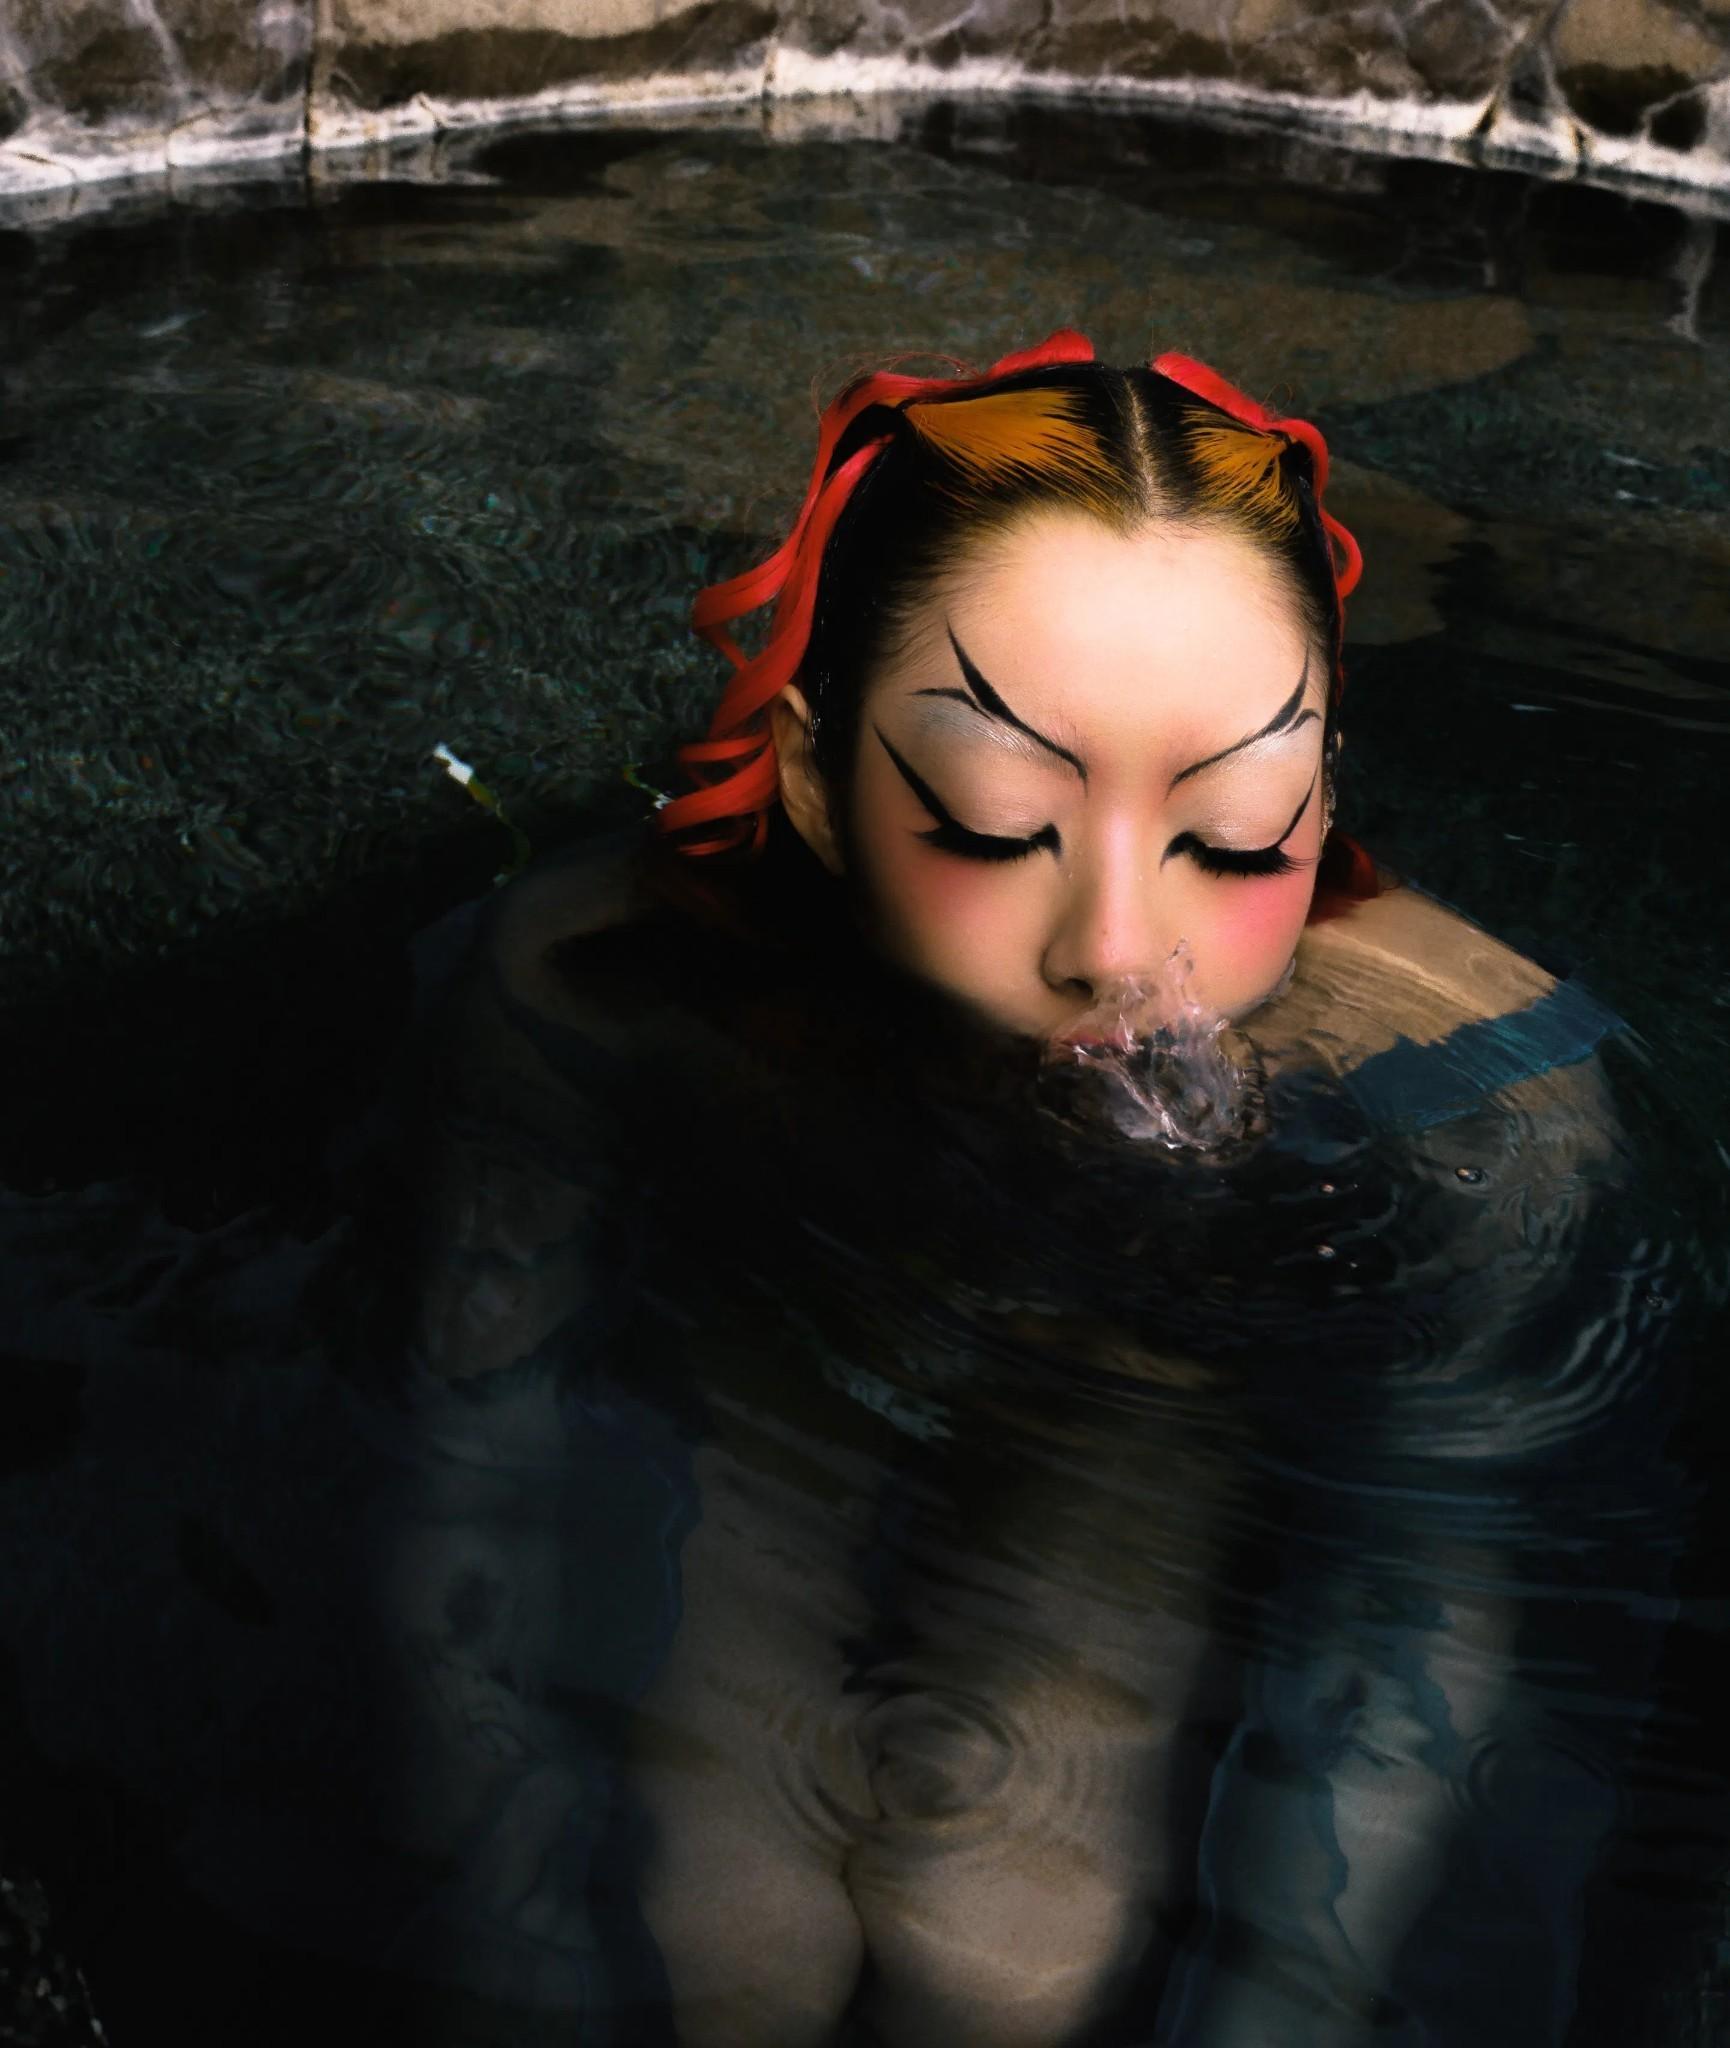 Rina Sawayama by Erika Kamano.